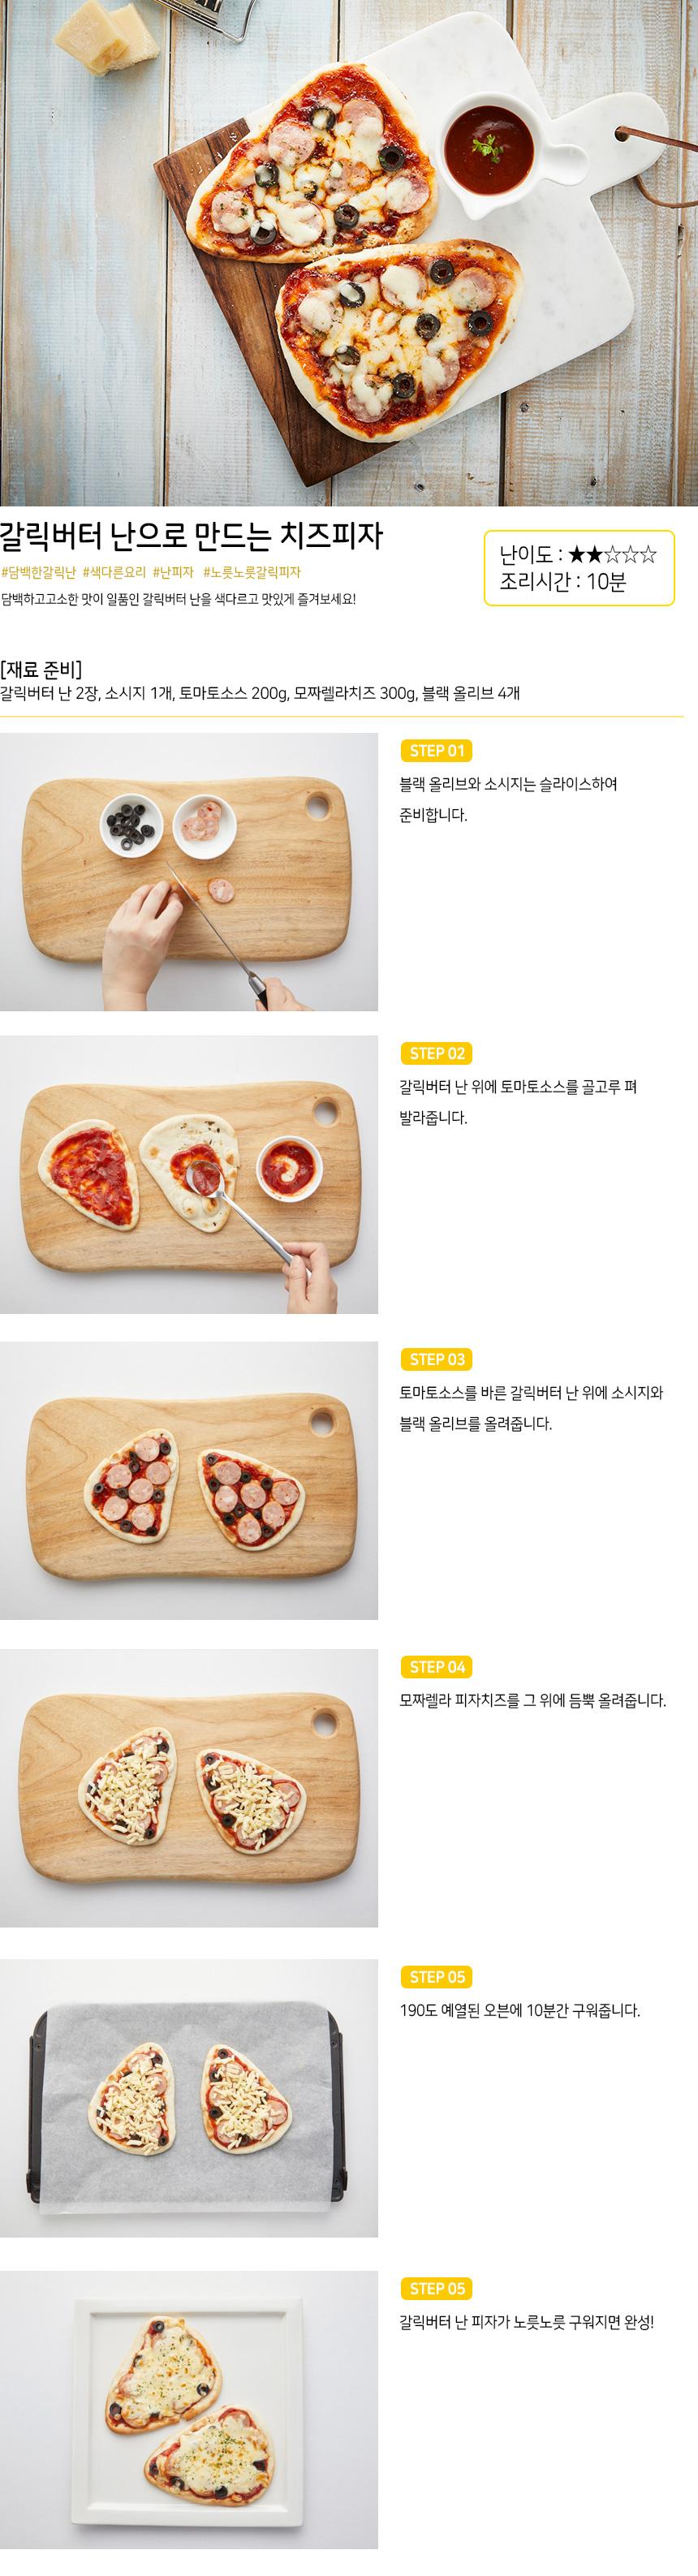 recipe_22111.jpg